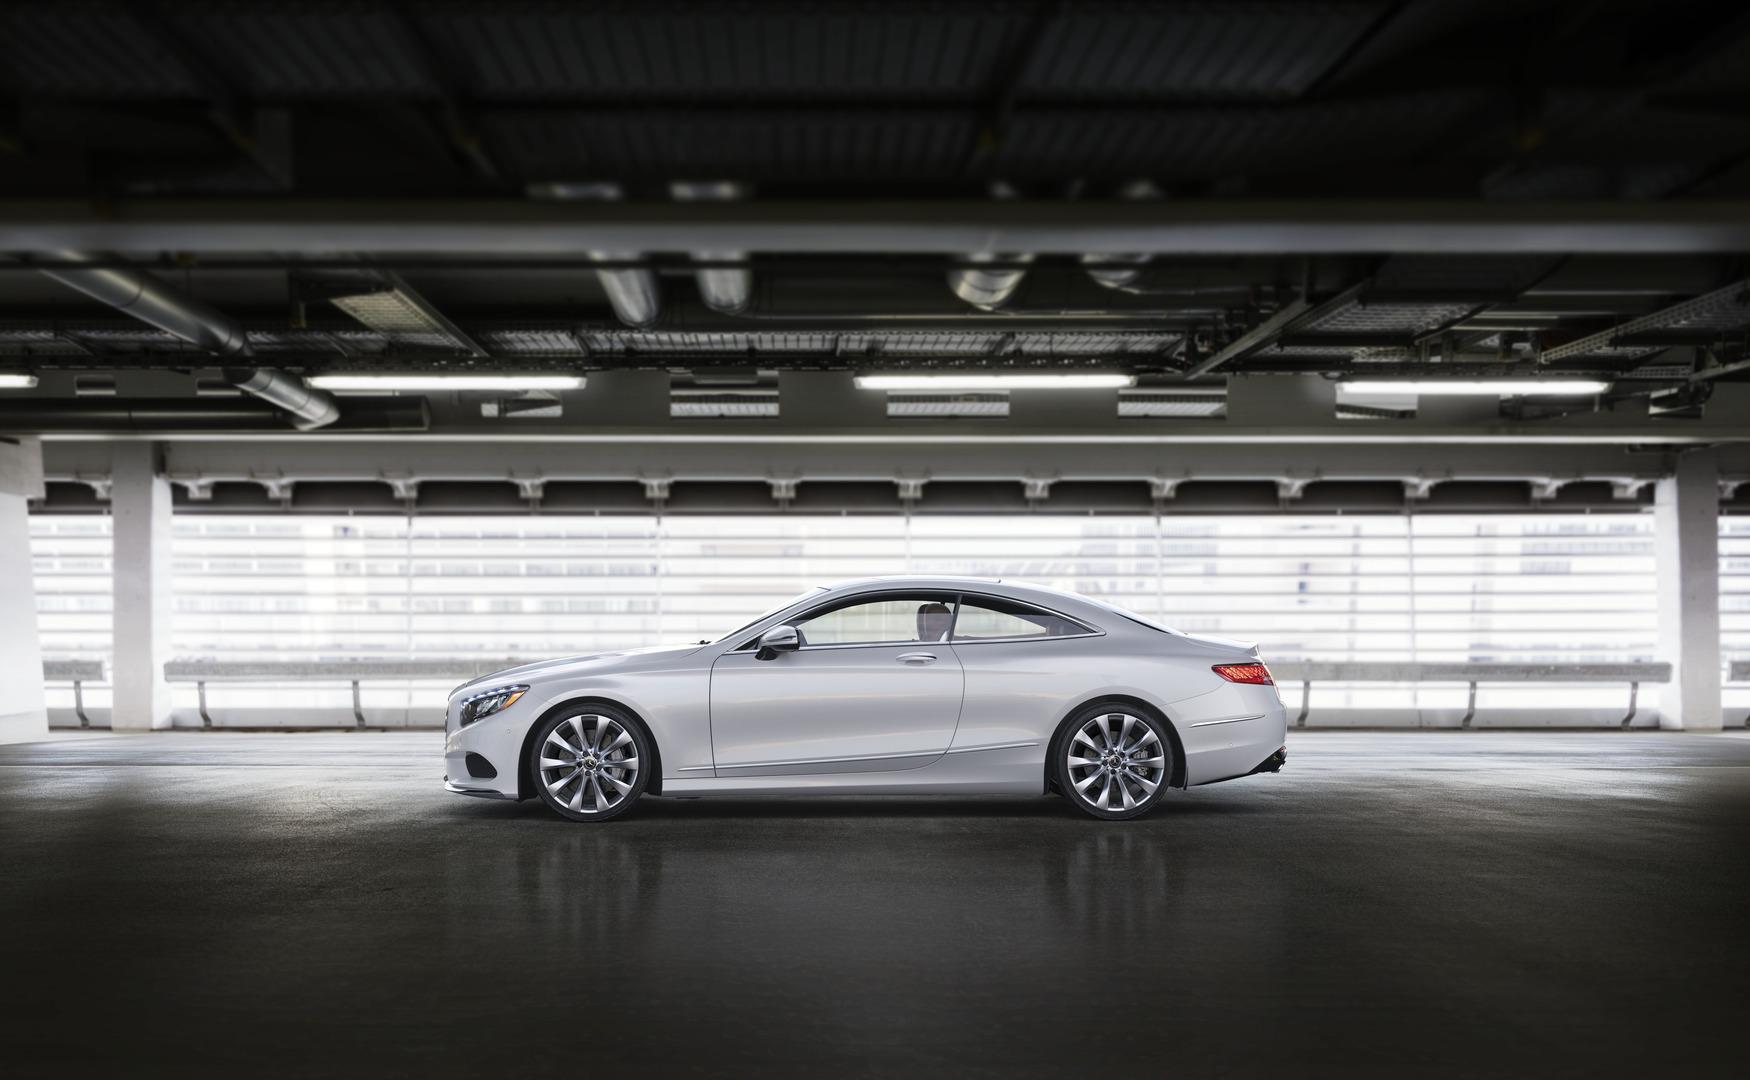 Mercedes-Benz Repair and Maintenance in Indio, CA